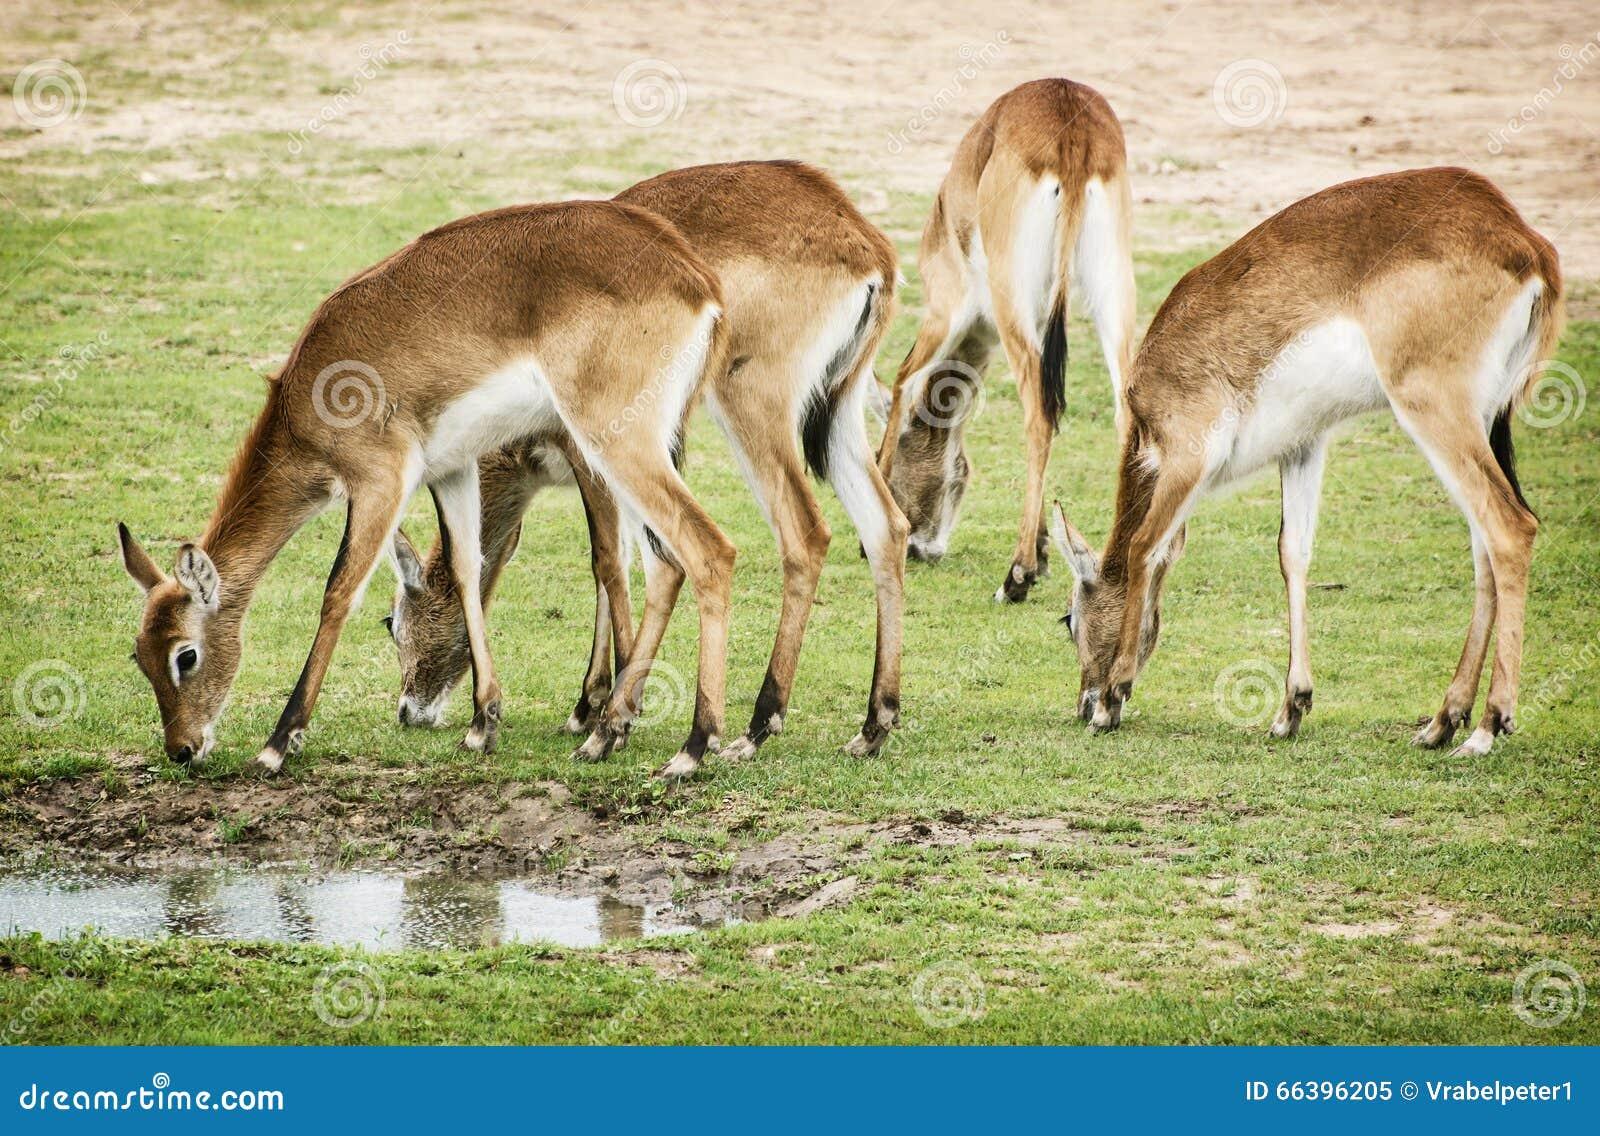 Group Of Animals Pictures | www.pixshark.com - Images